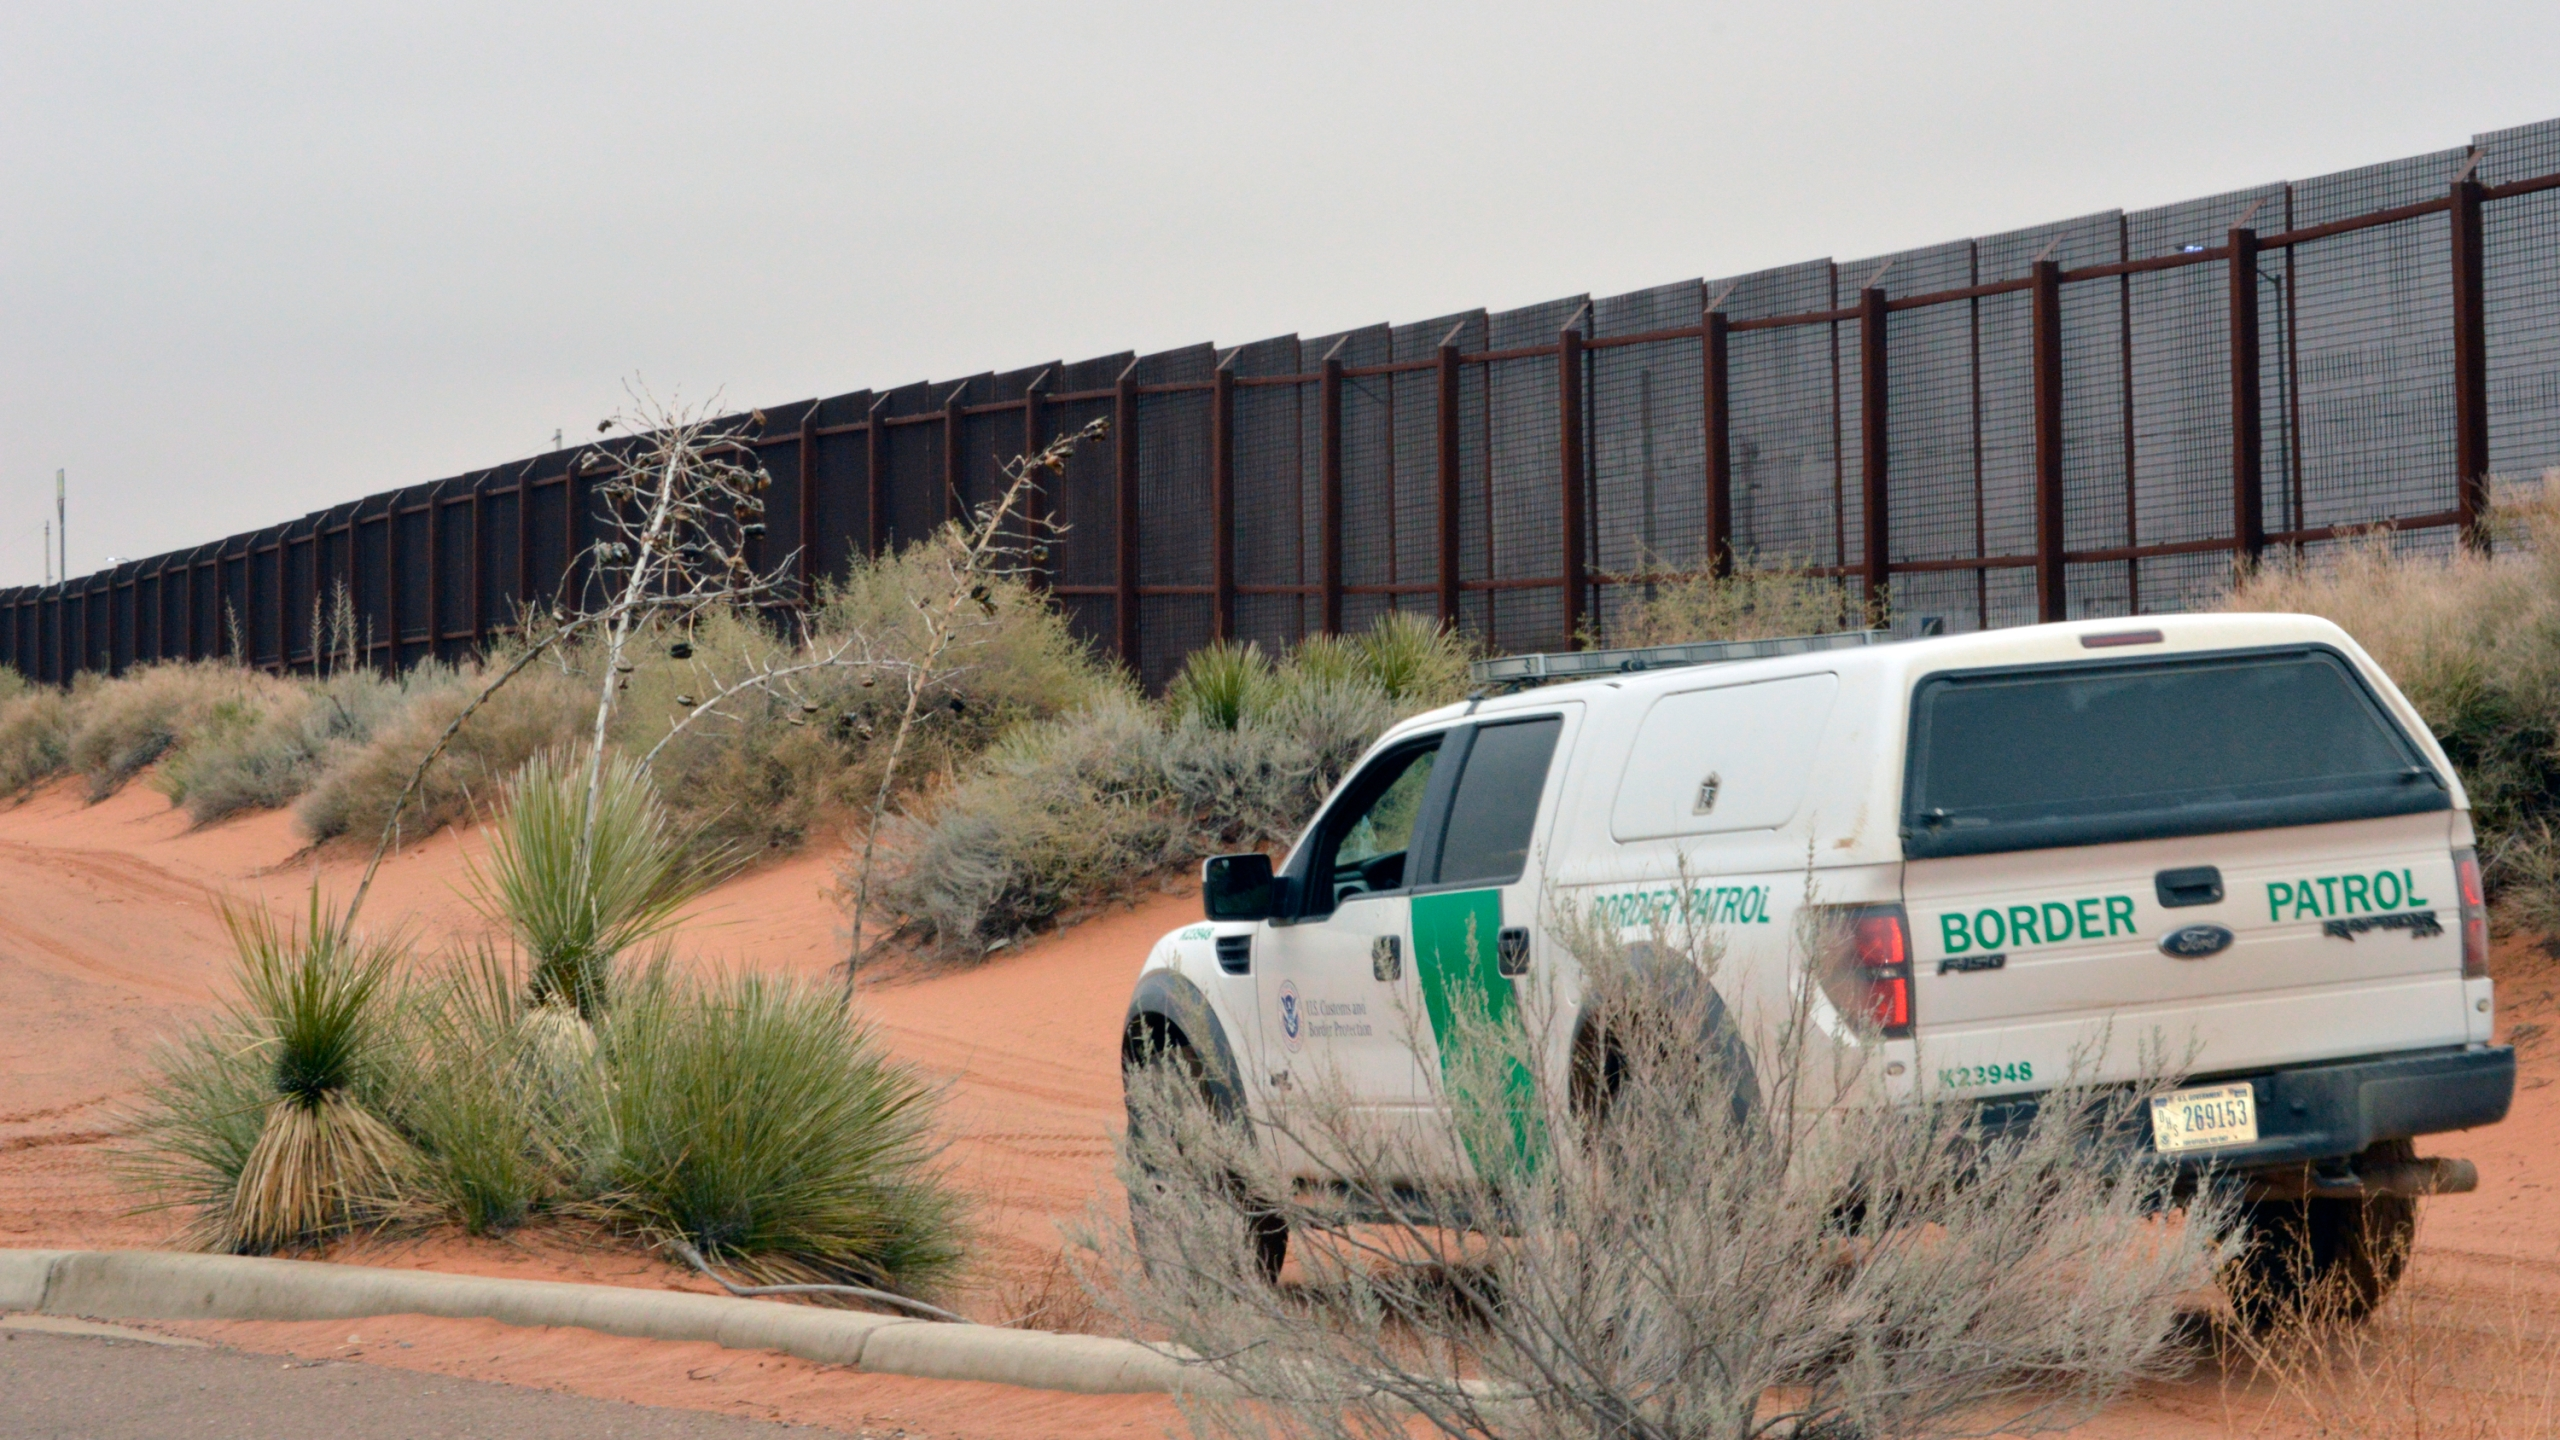 Border_Wall_74966-159532.jpg41863512